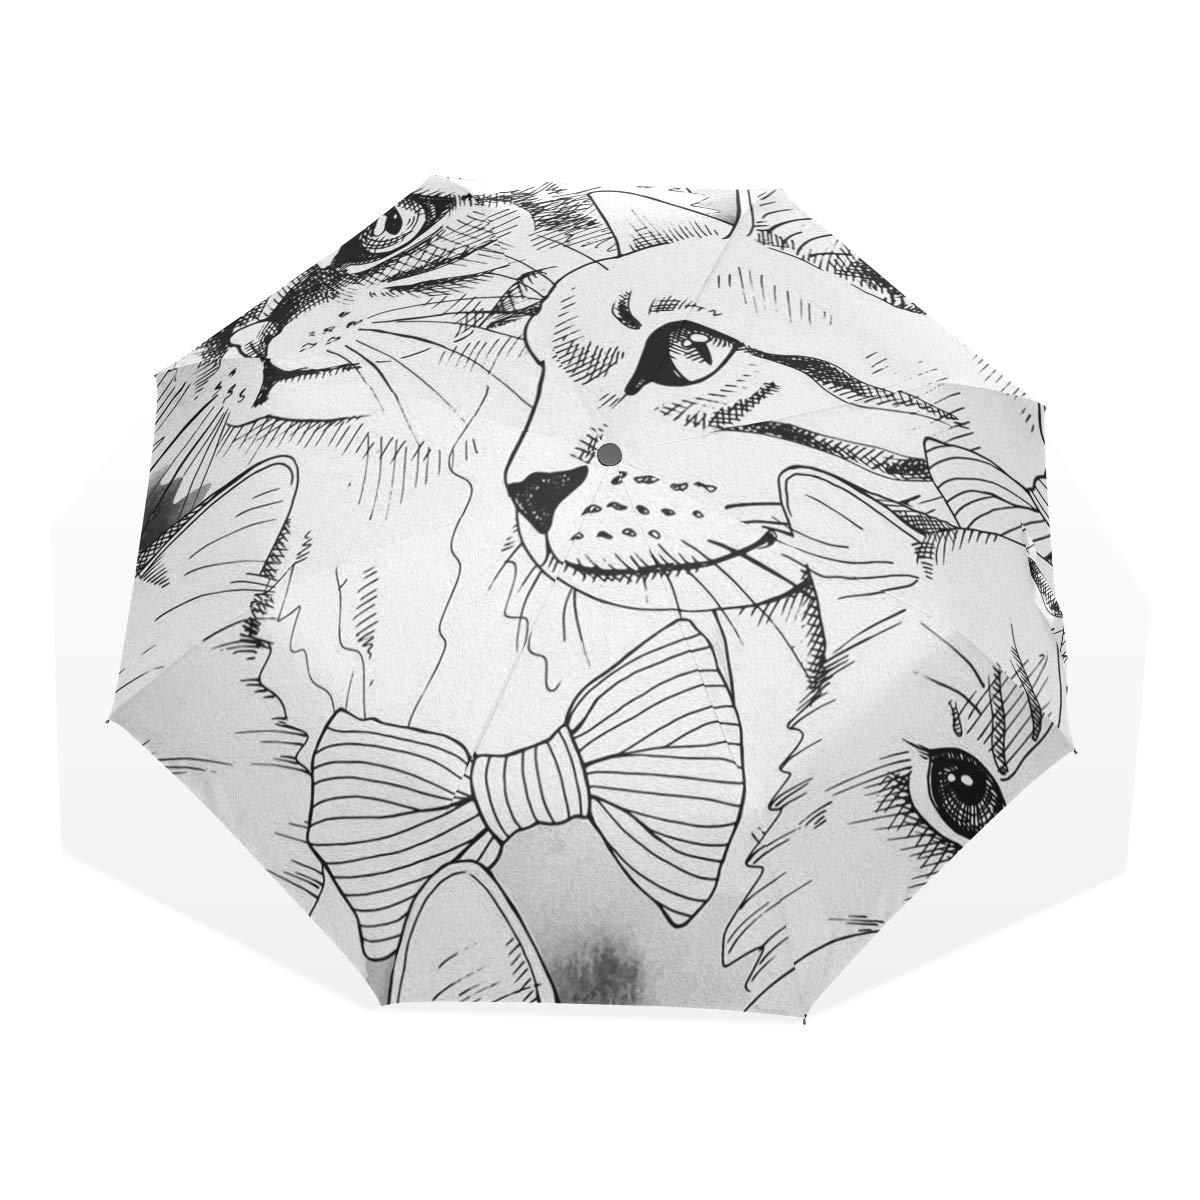 Umbrella cat sketch n draw nauto open umbrella waterproof lightweight anti uv sun rain umbrella folding compact travel umbrella outdoor golf umbrella for